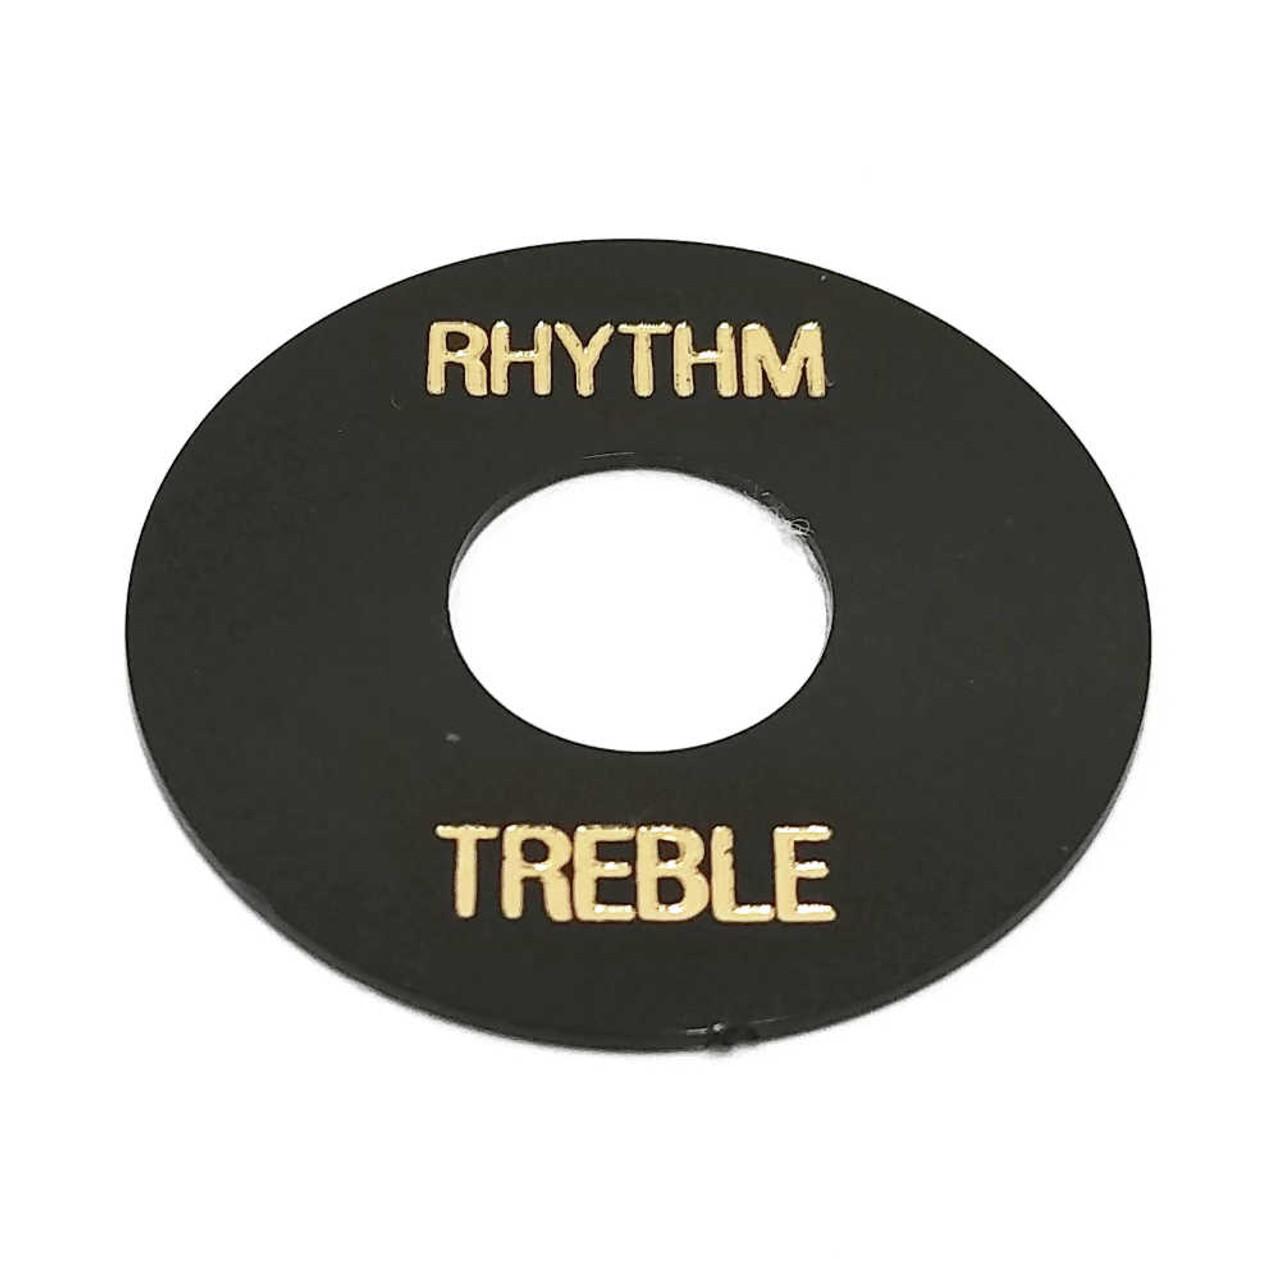 Rhythm/Treble Ring - Black /w Gold Letters